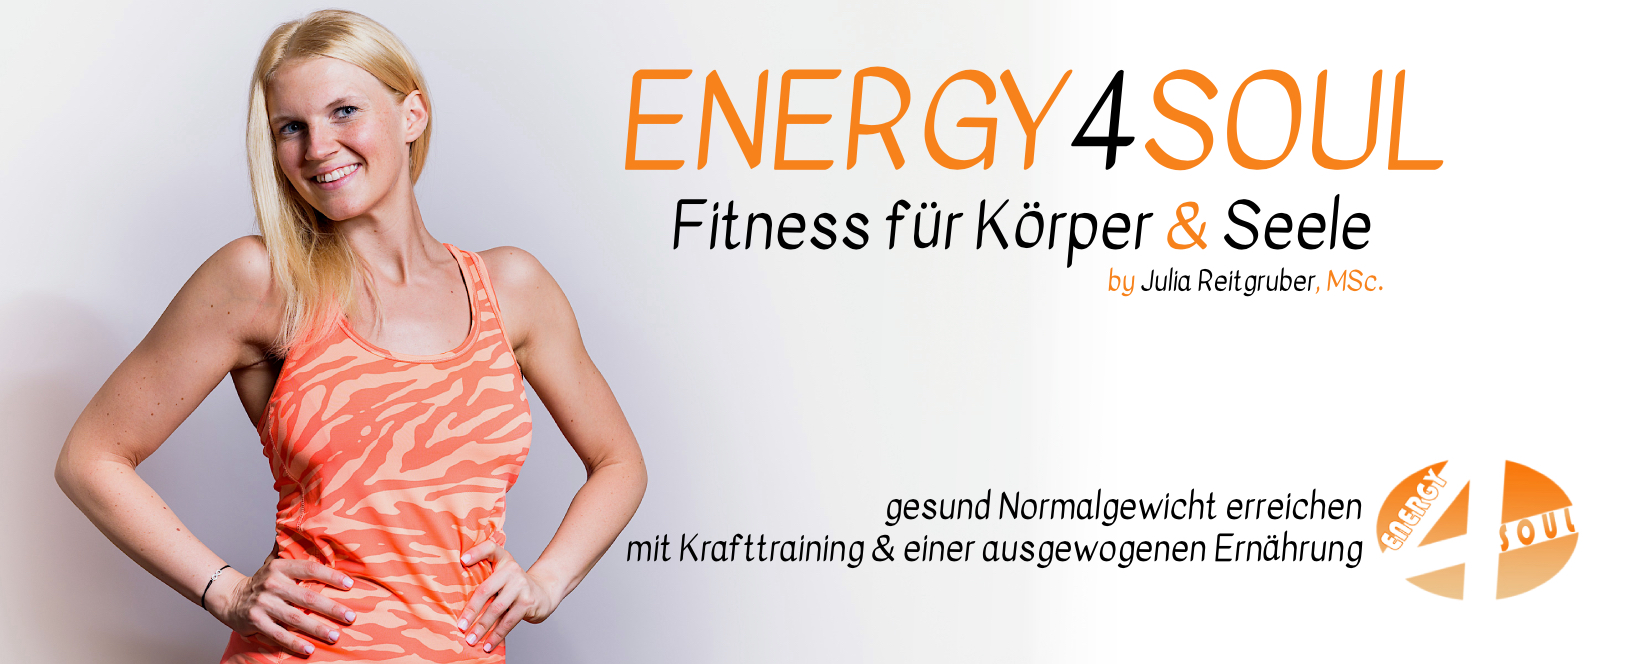 energy4soul titelbild